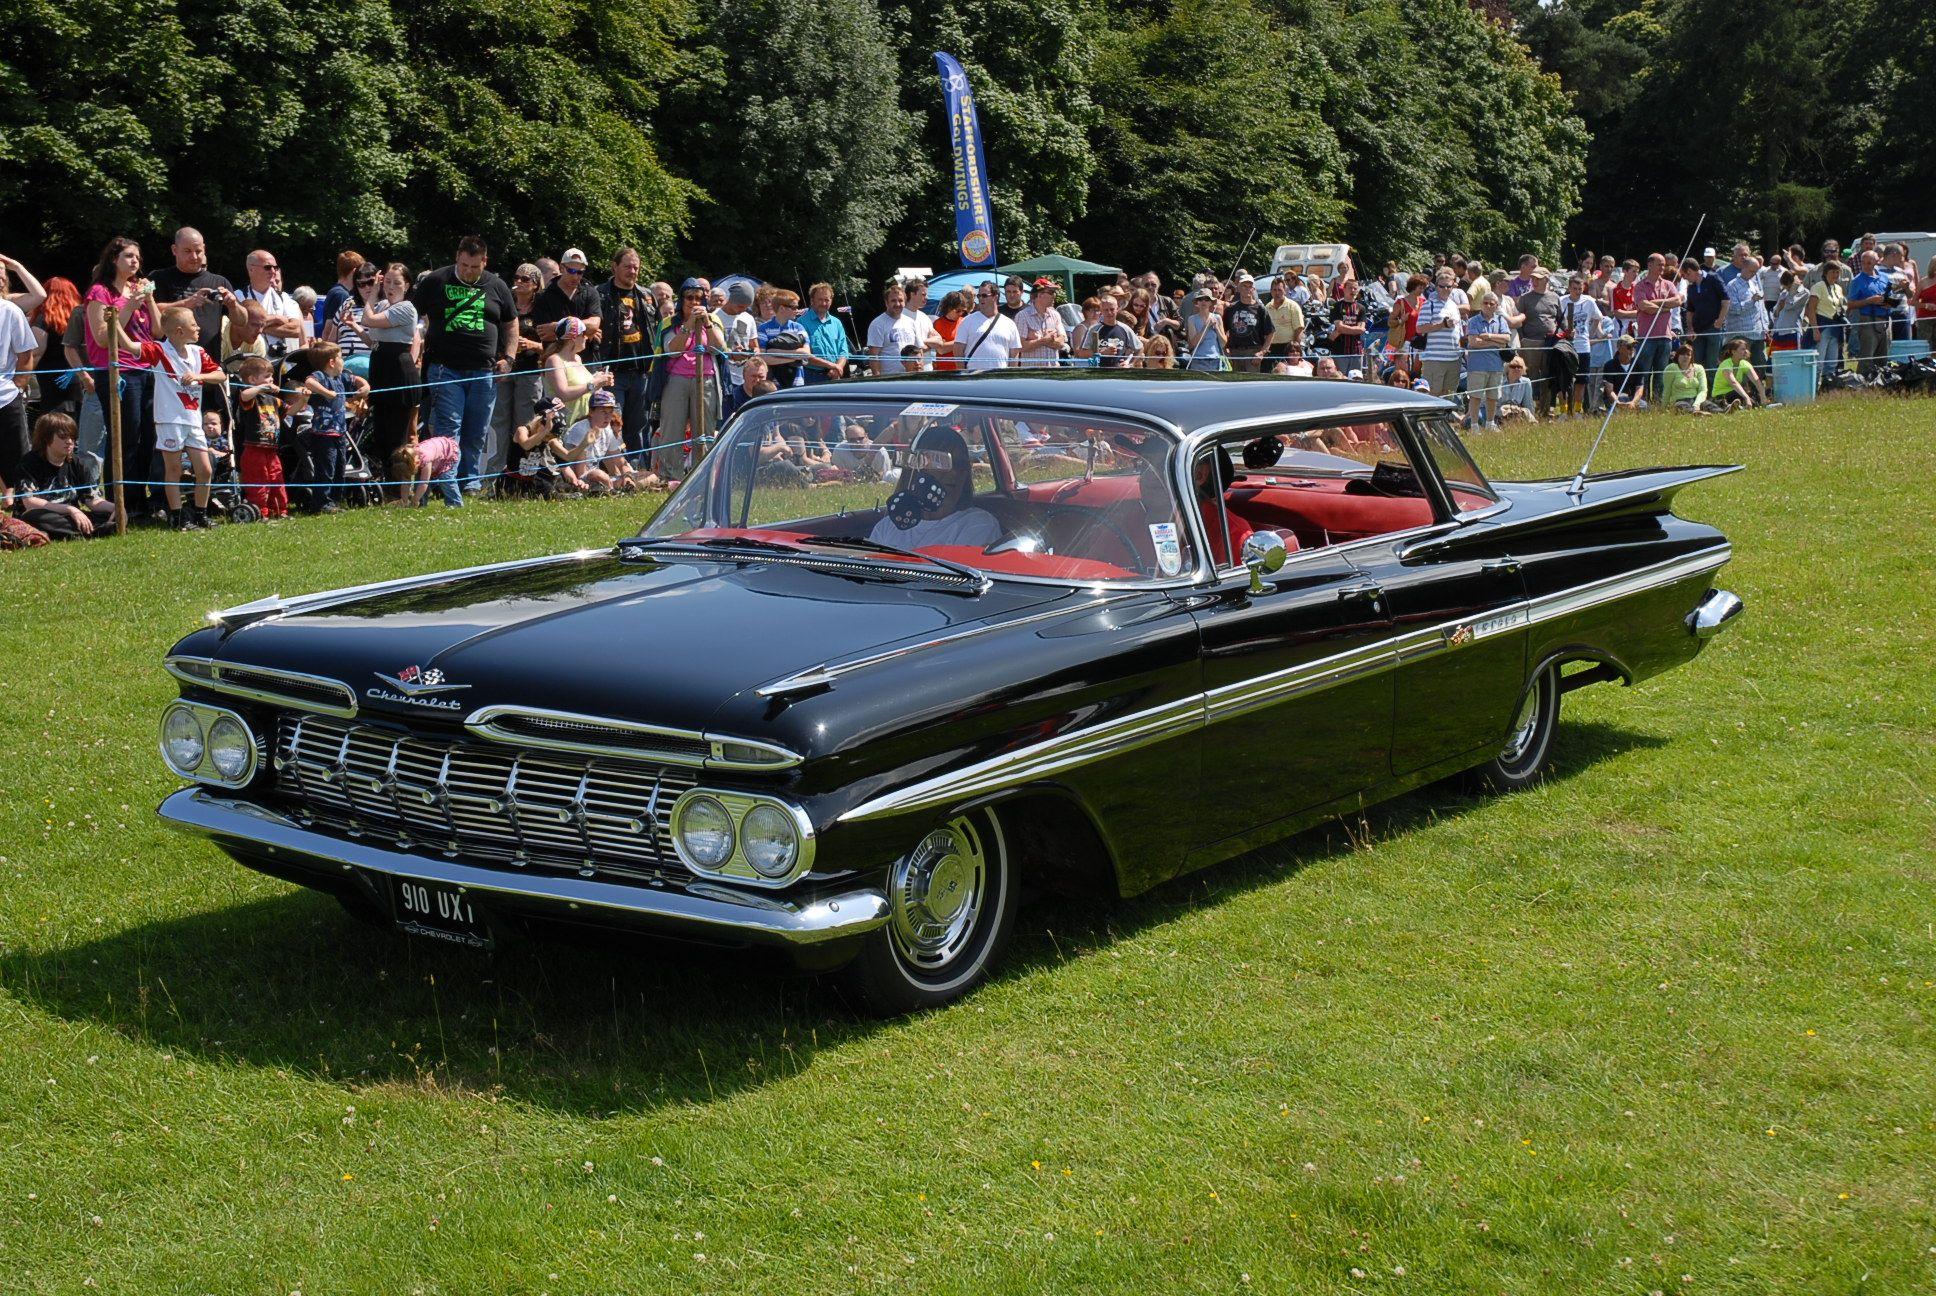 Classic American Cars | STARS & STRIPES CLASSIC AMERICAN CAR SHOW ...